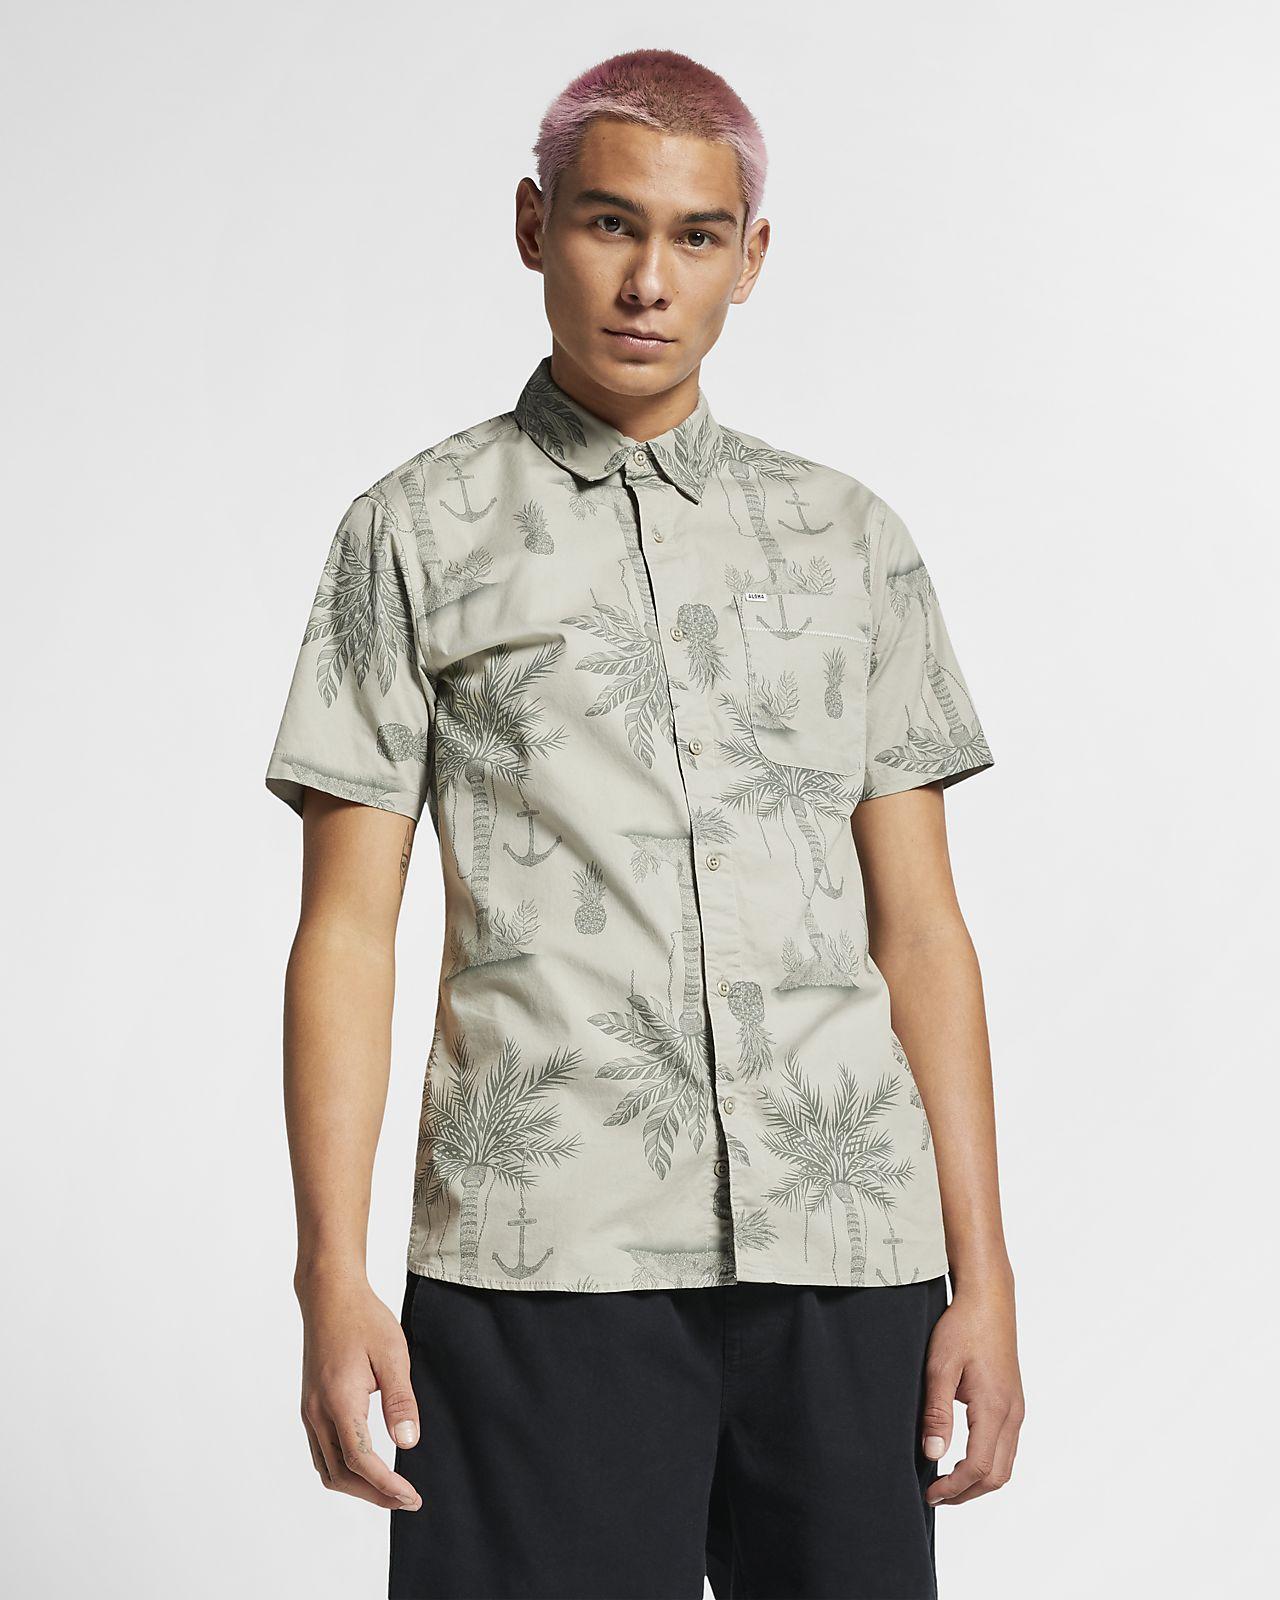 Hurley Asylum Stretch Men's Short-Sleeve Shirt